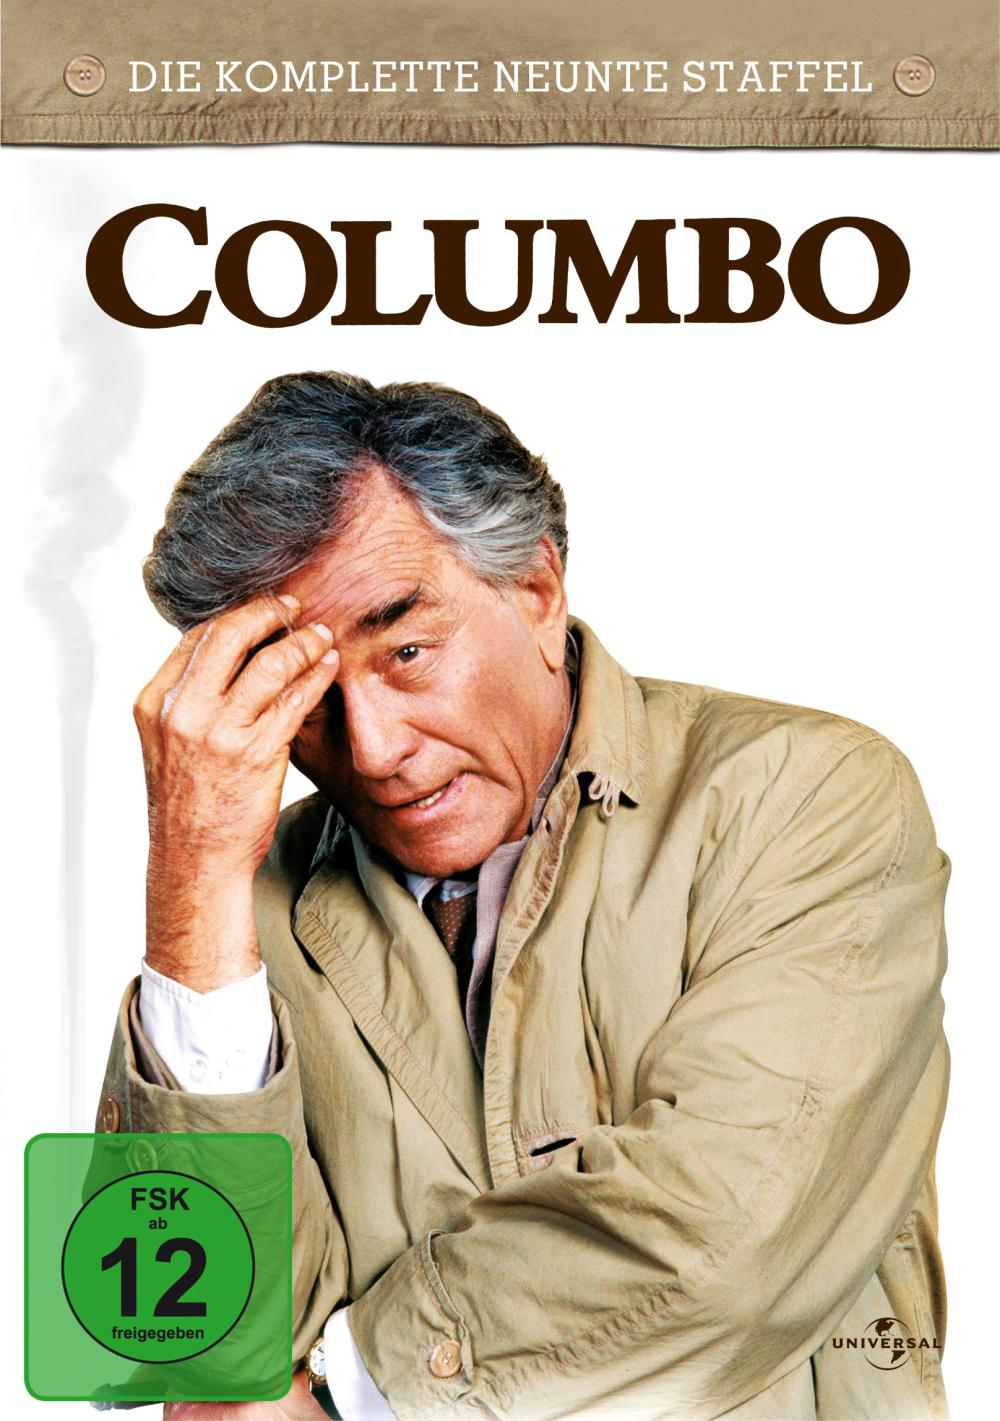 Columbo Todessymphonie Darsteller